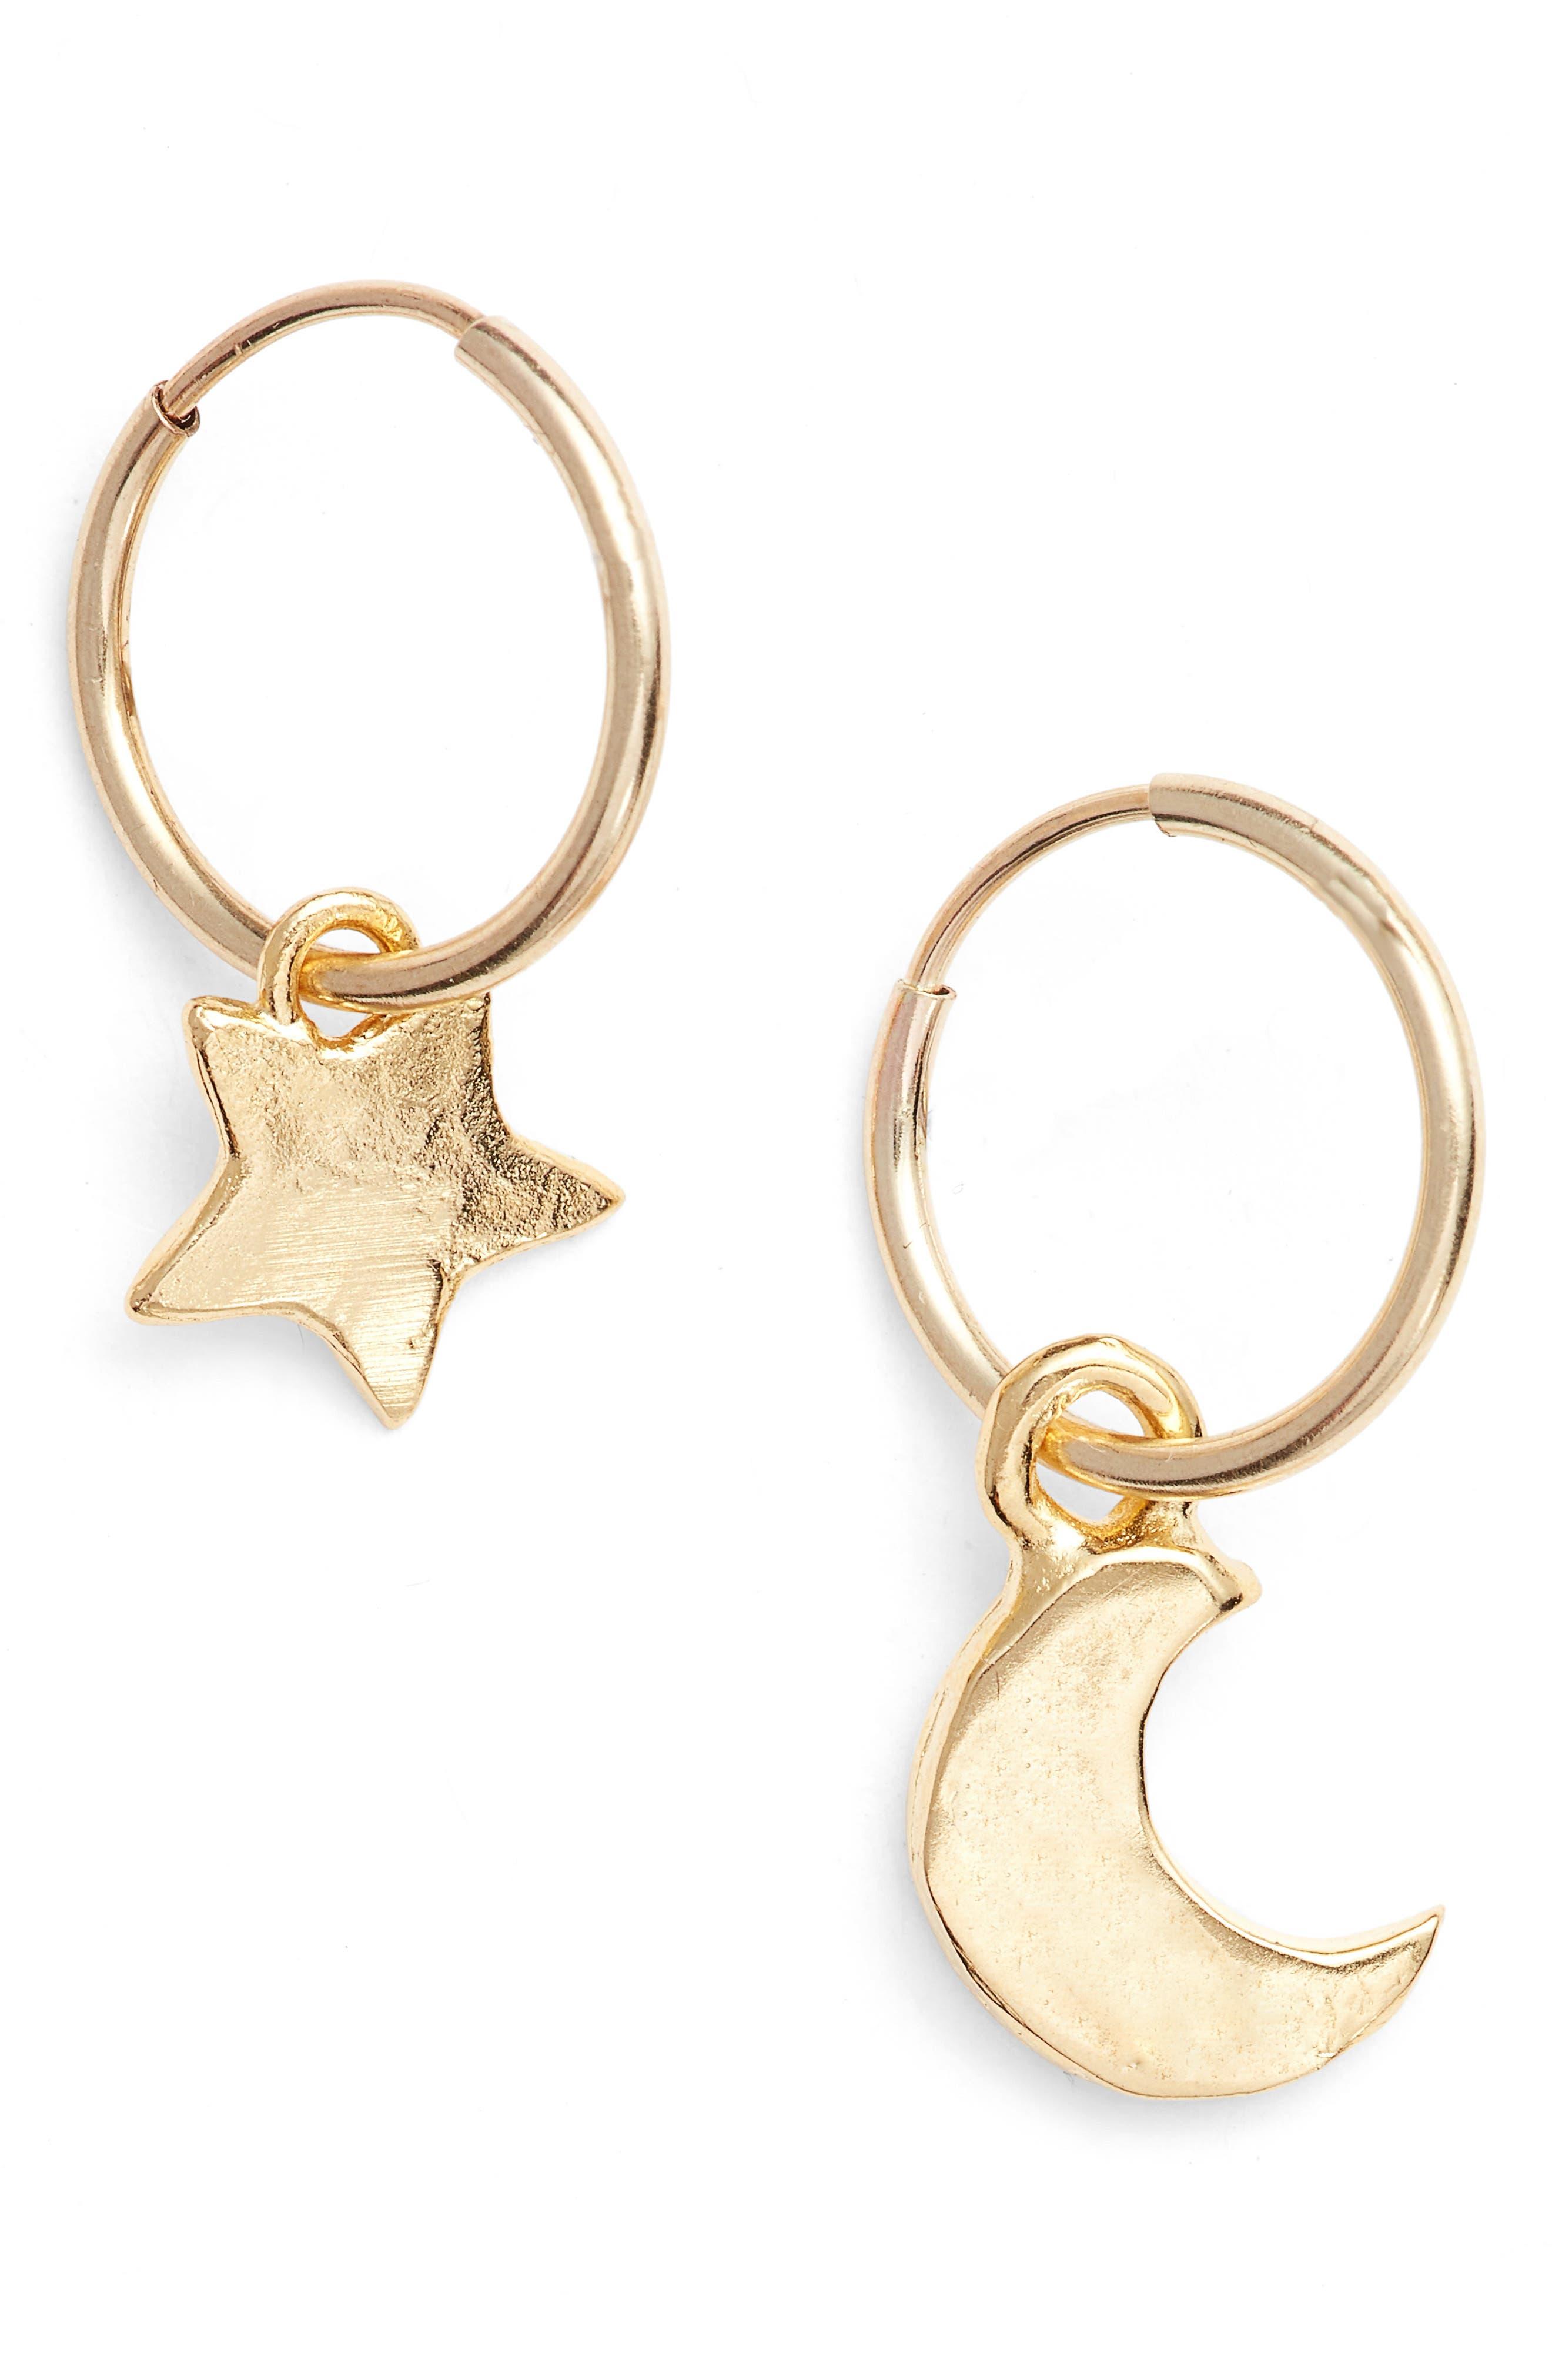 Britt Bolton Moon & Star Drop Earrings